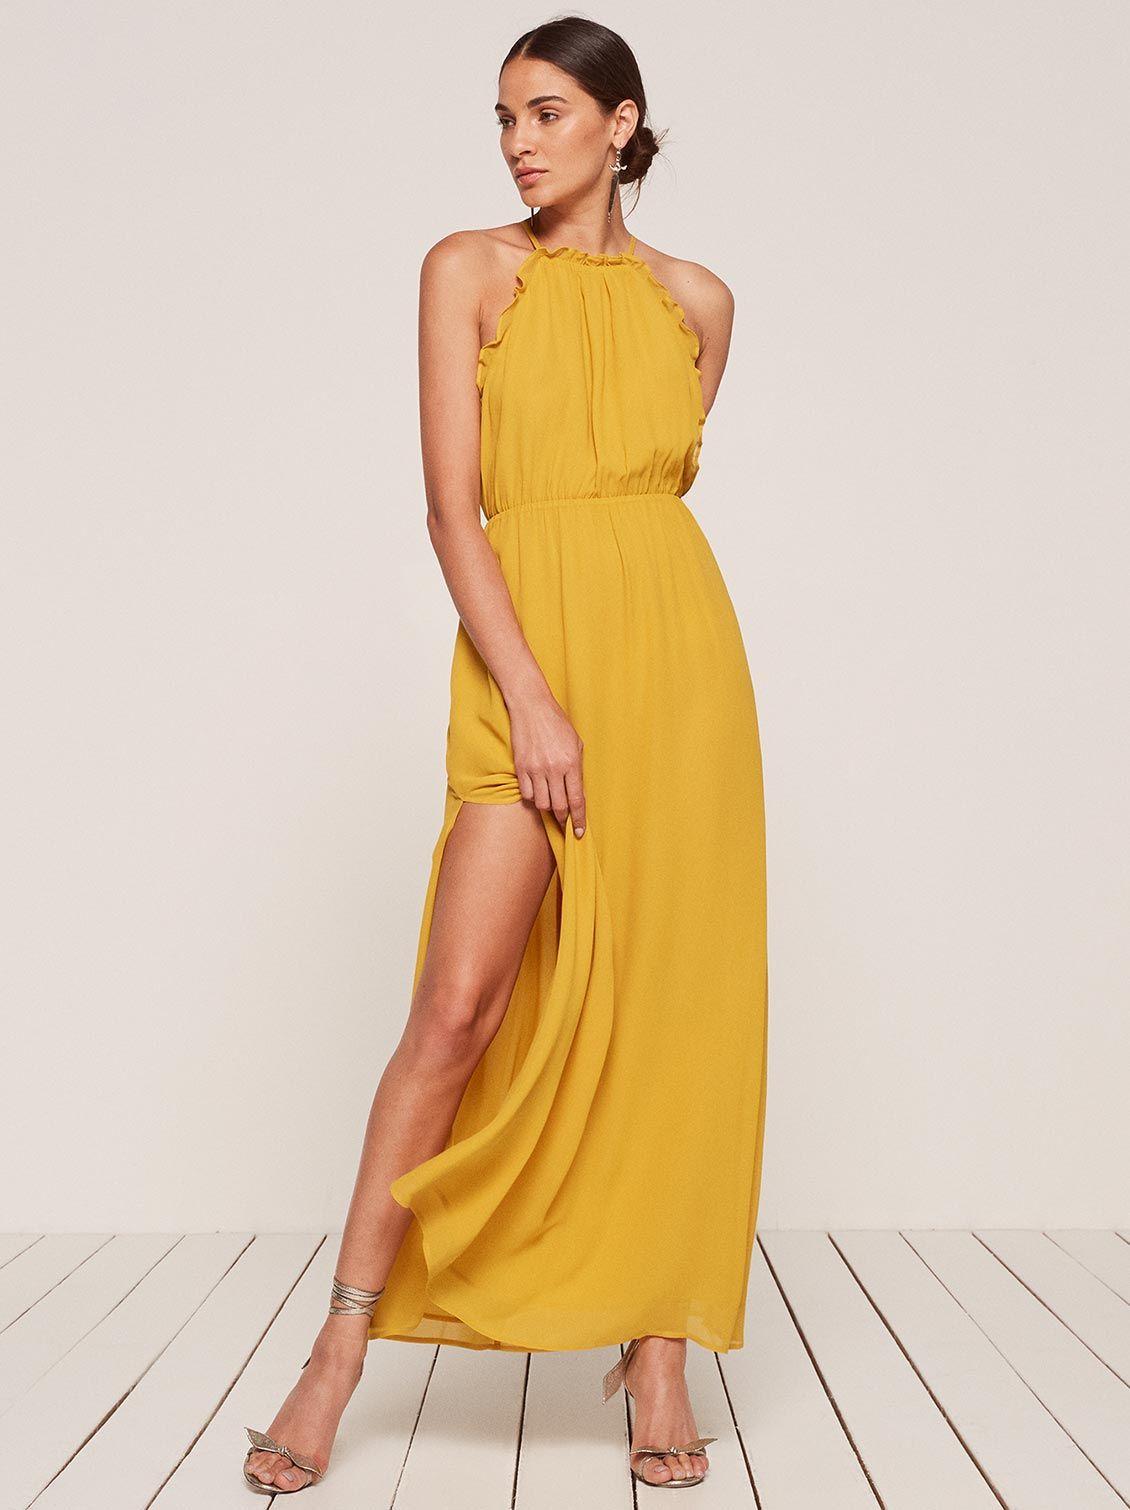 2068f32d12 Rambla halter maxi dress sunflower yellow Reformation